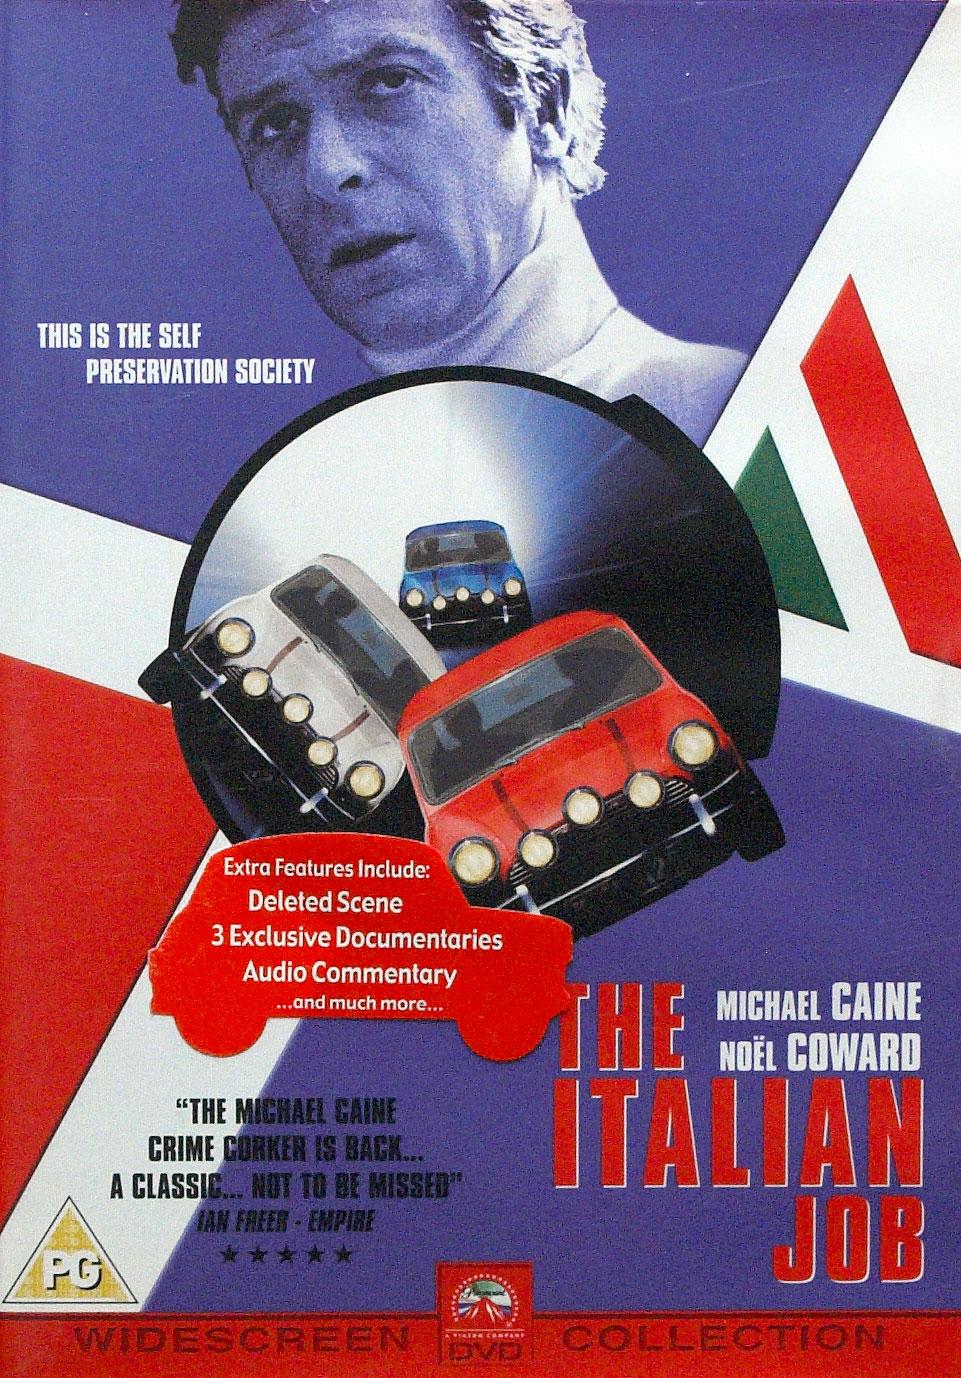 Italian Job 1969 Poster images - 445.0KB